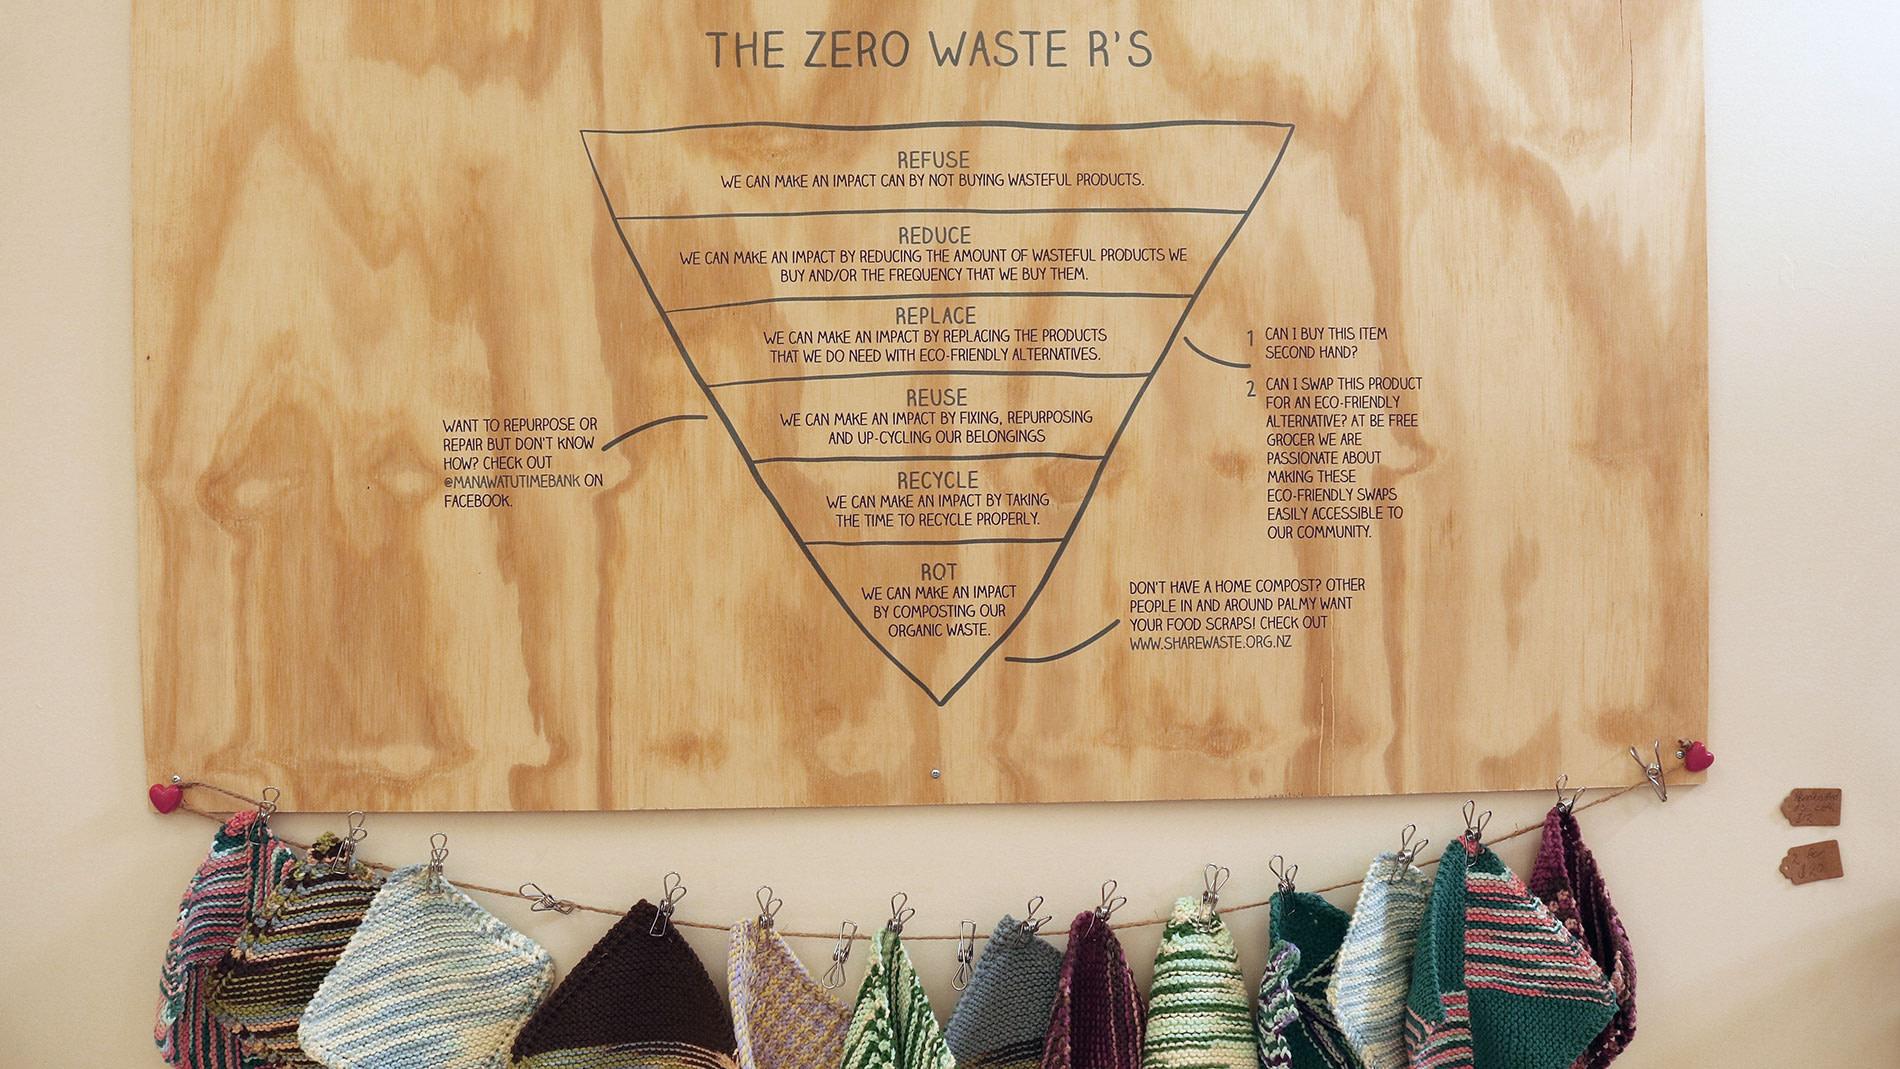 Zero Waste Rs